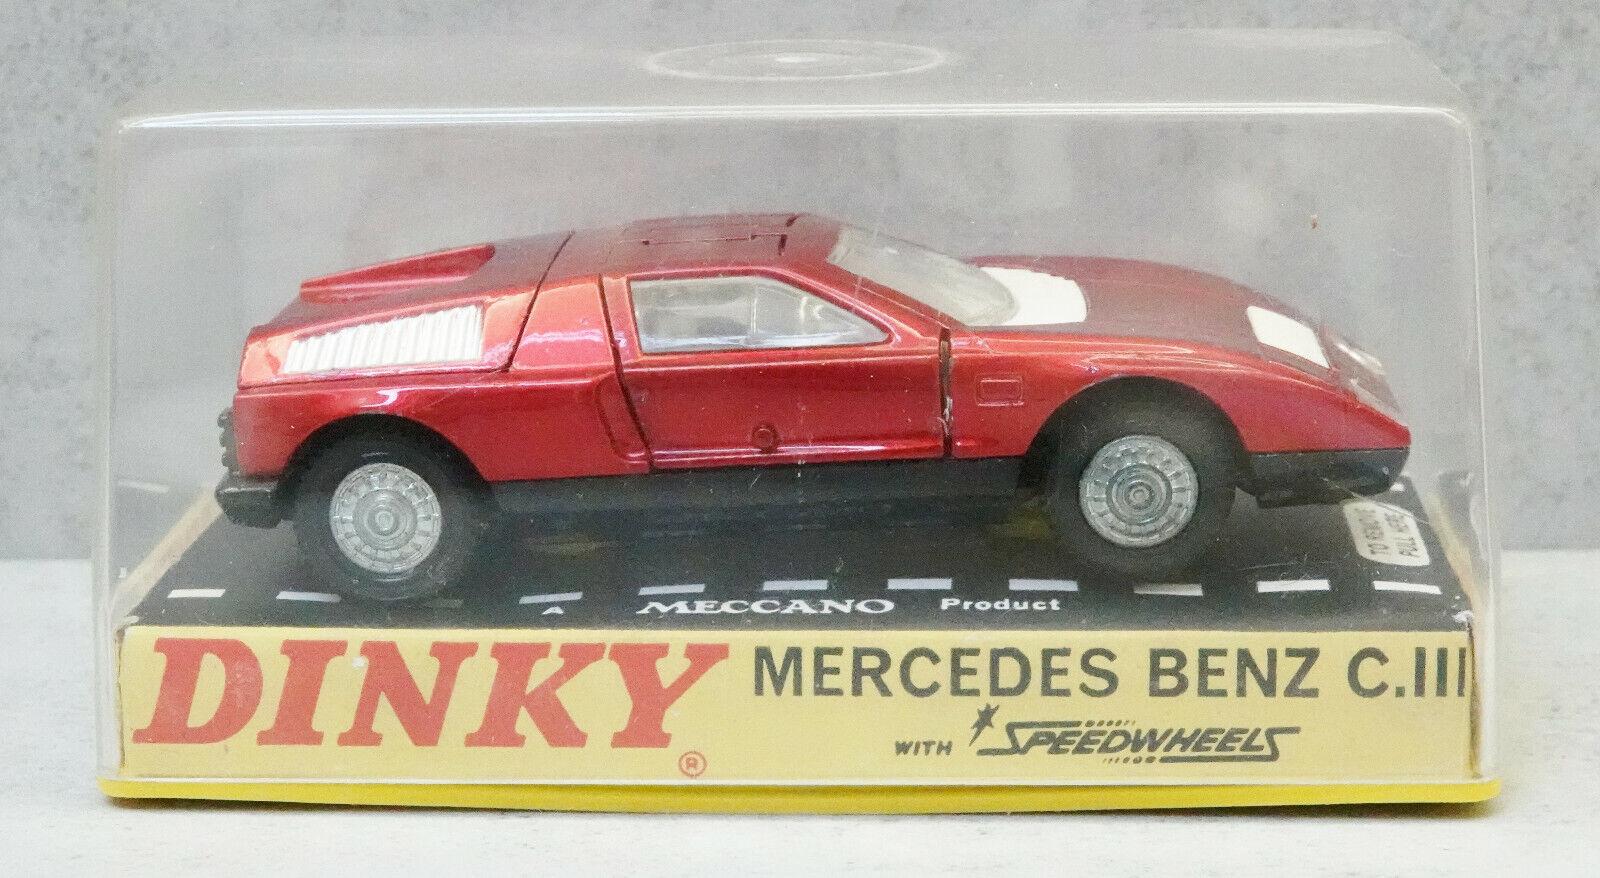 Original Dinky 224 Mercrdes Benz C.III rot Near Mint Boxed